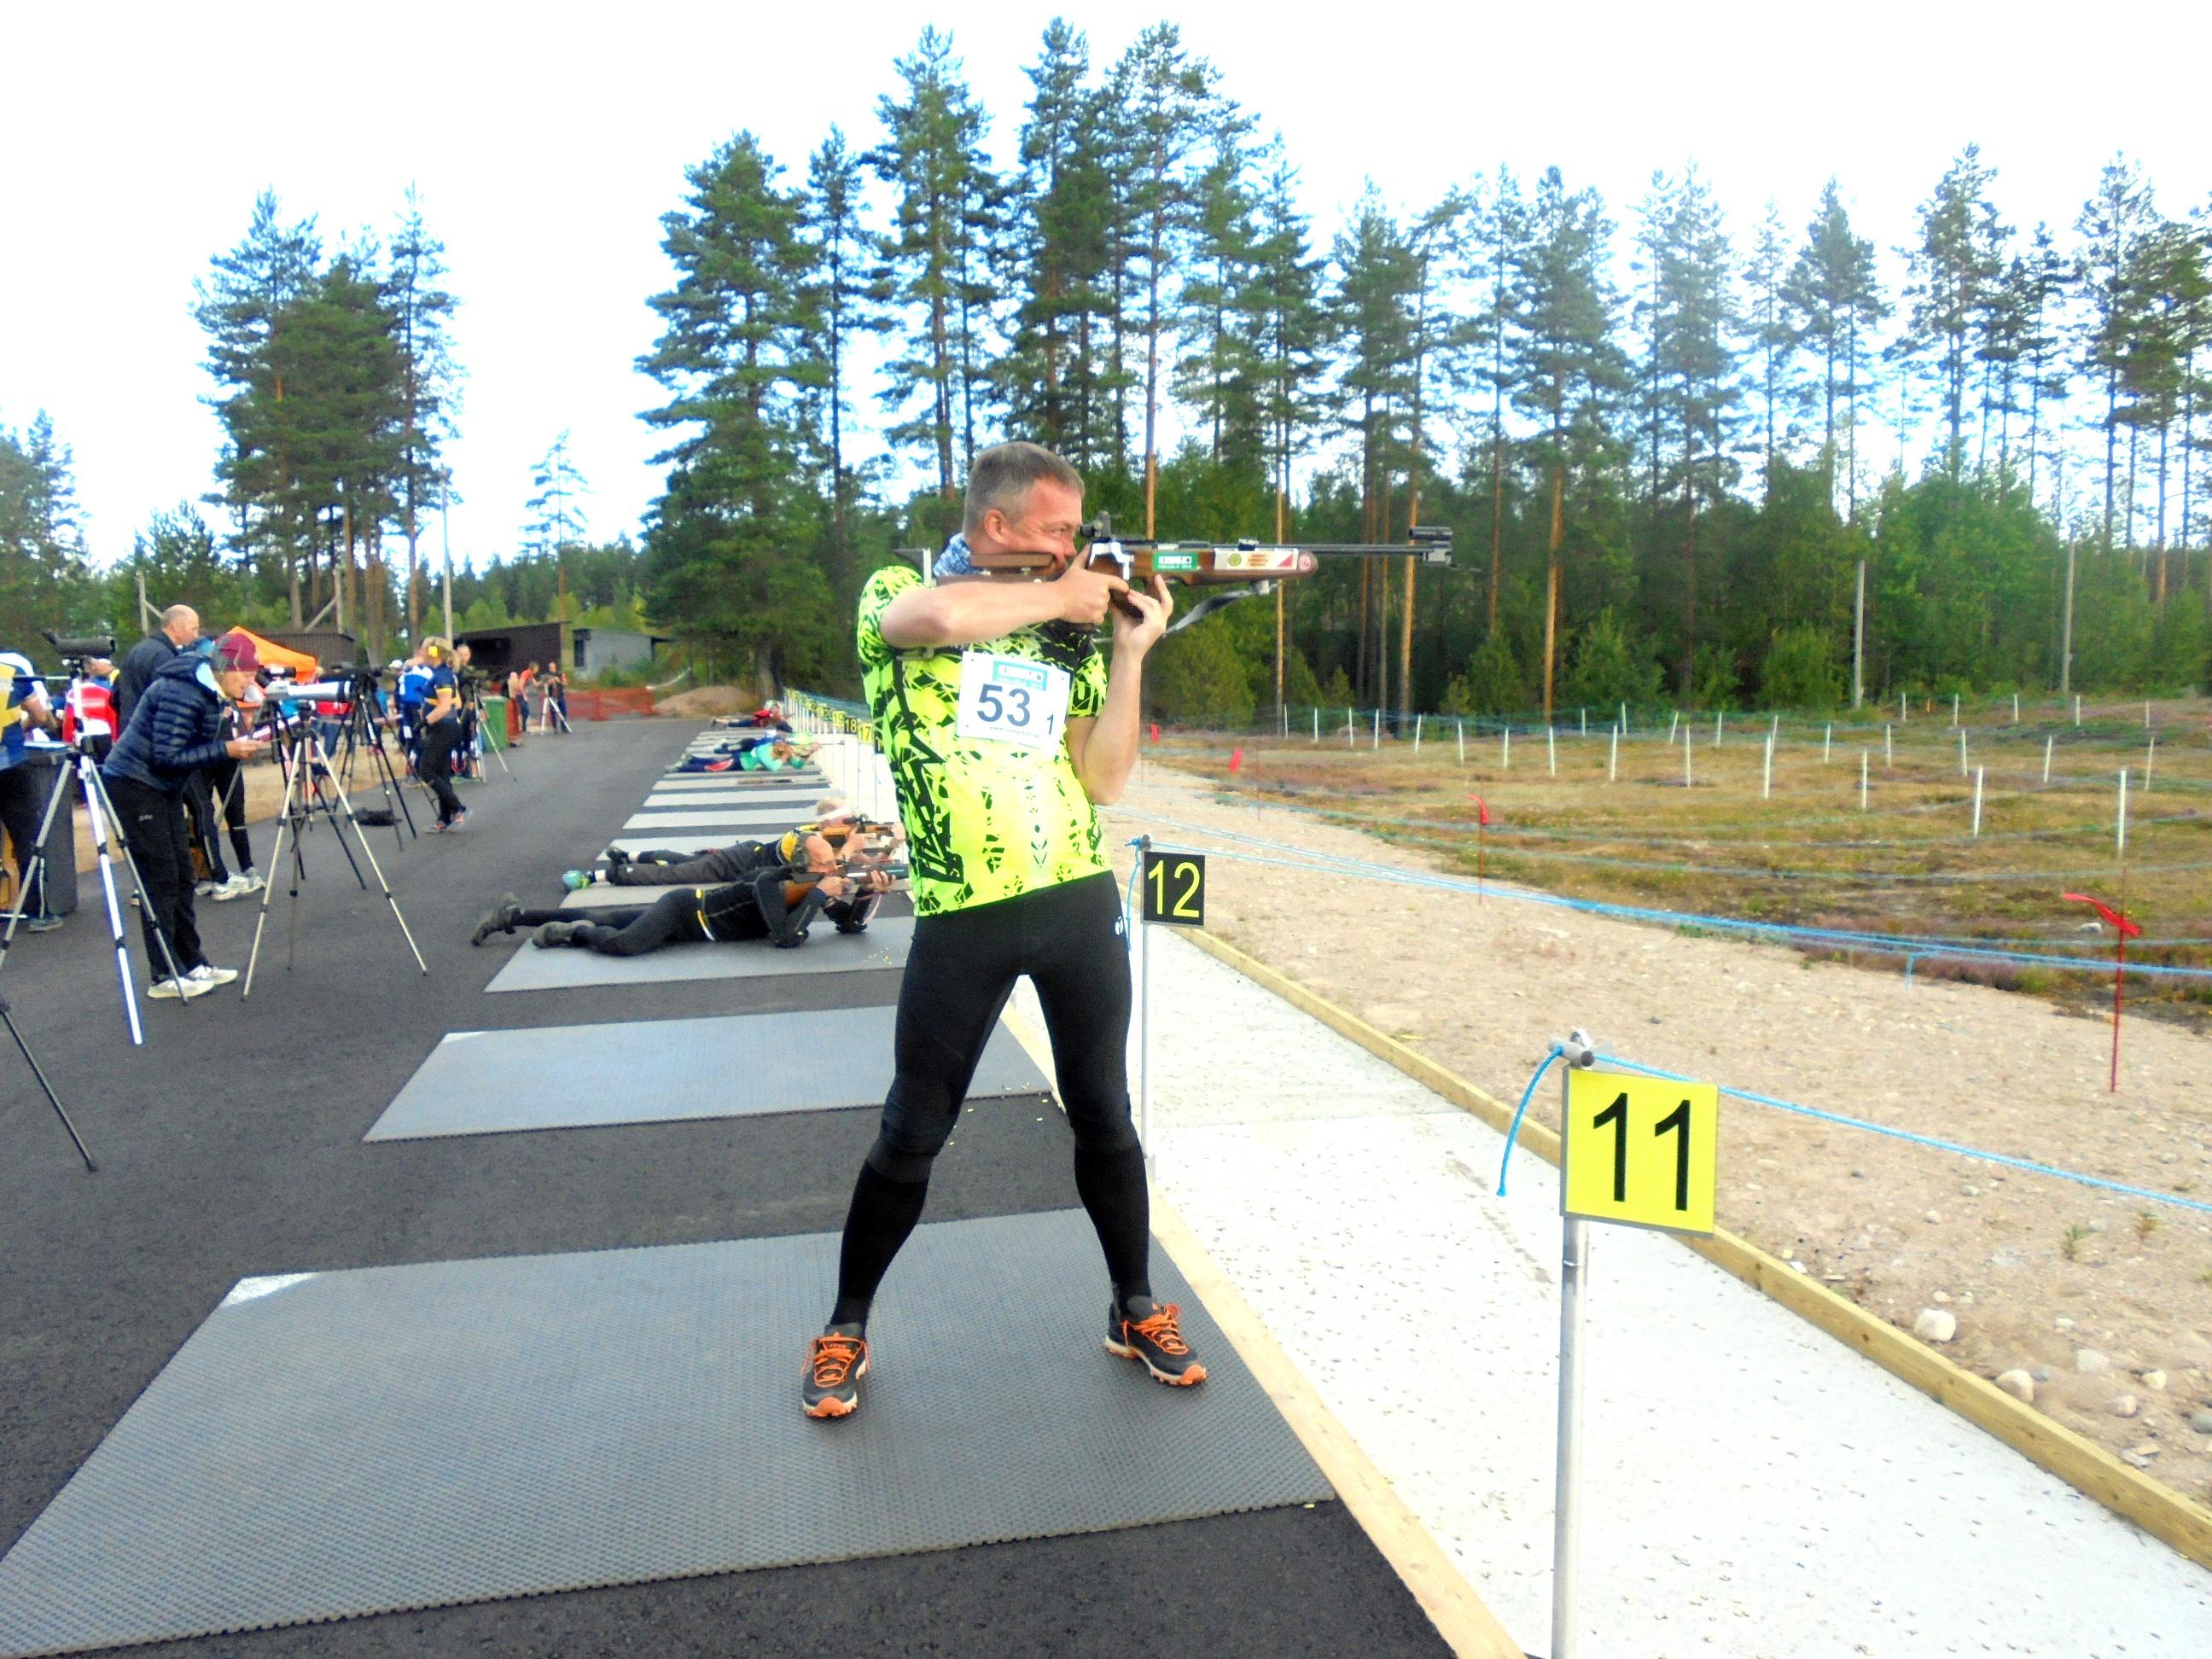 wm-in-biathlon-ol-6.jpg